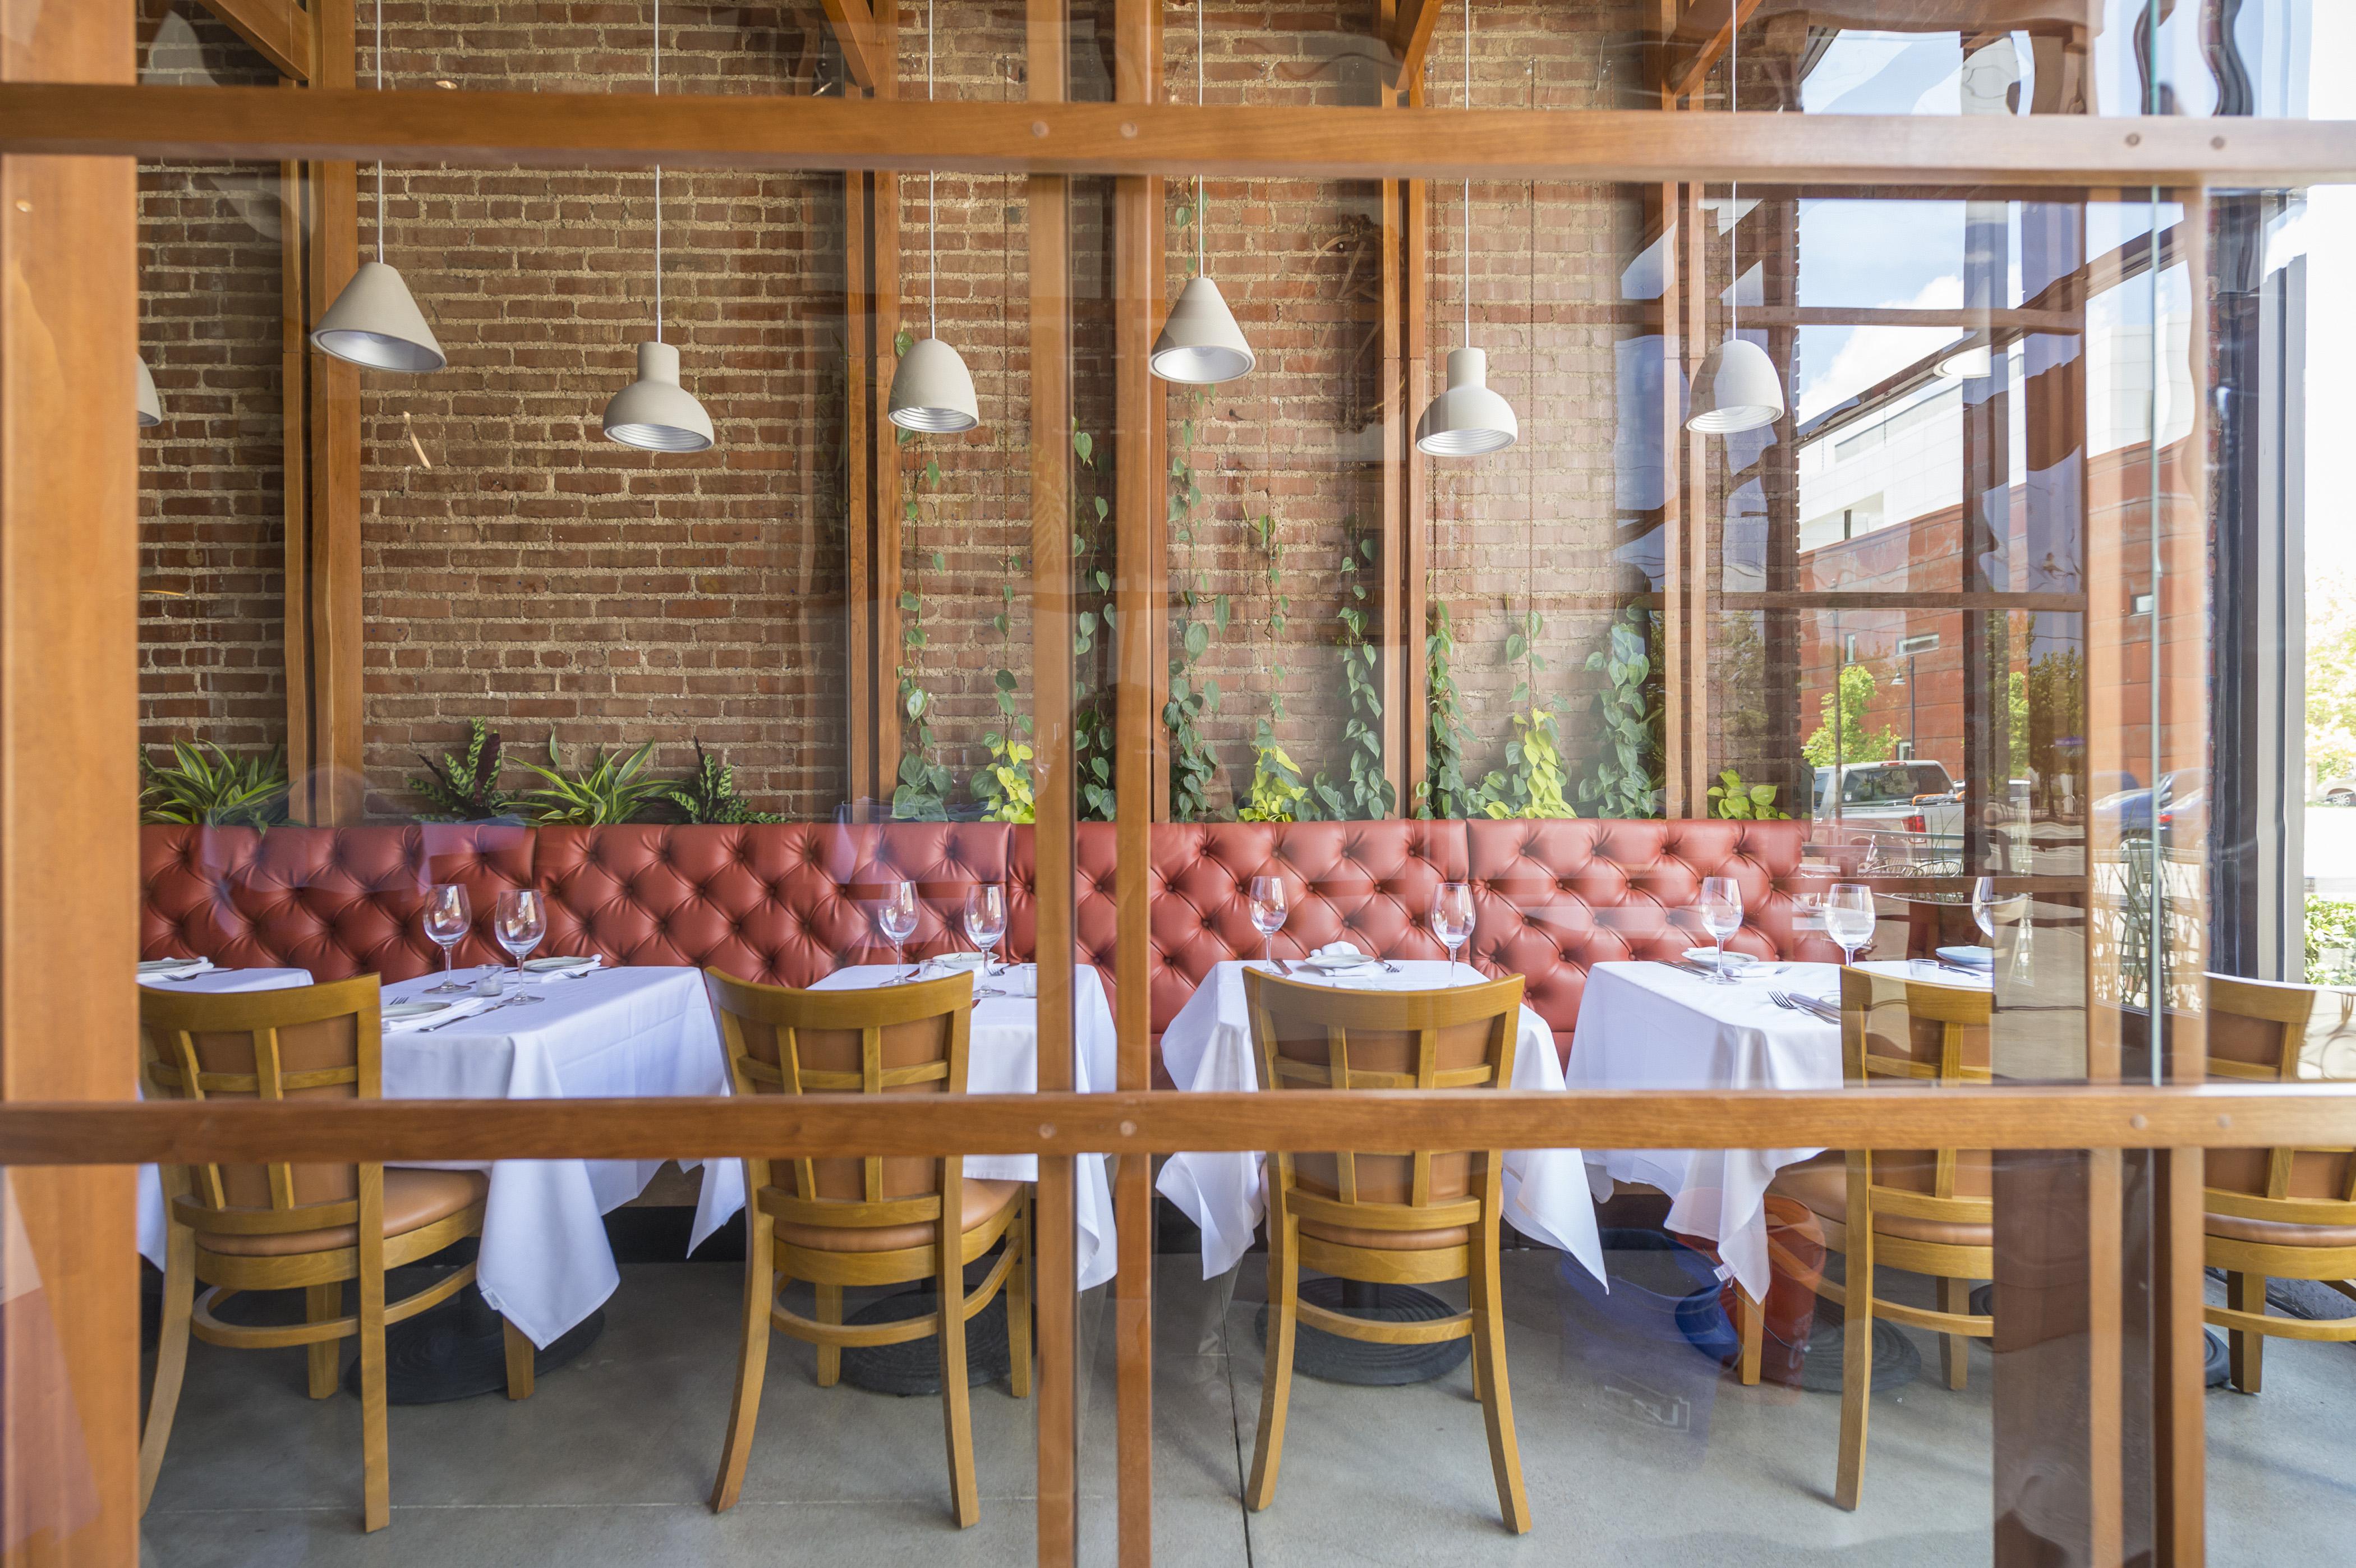 06 12 2017 Amelia's restaurant SILO EC0088